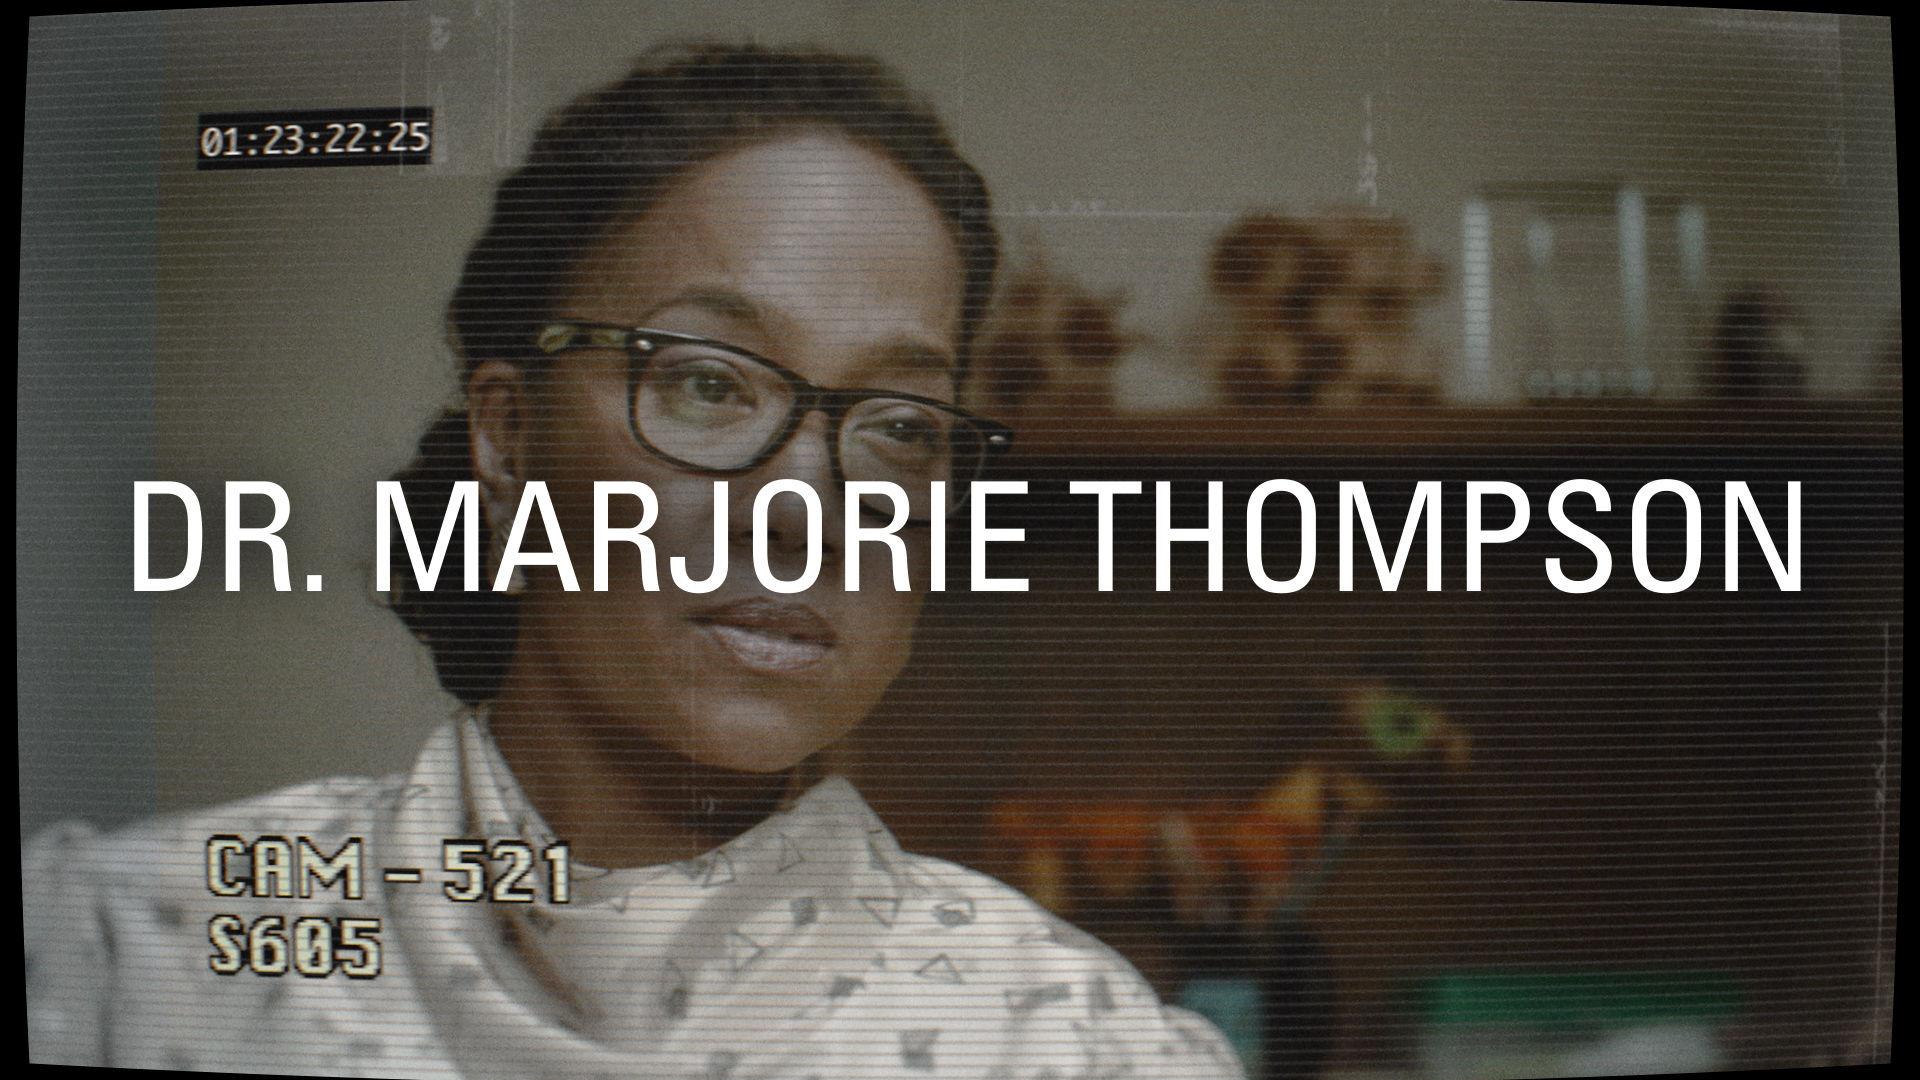 Допрос — s01e04 — L.A. County Psychologist Marjorie Thompson vs. Eric Fisher 1984